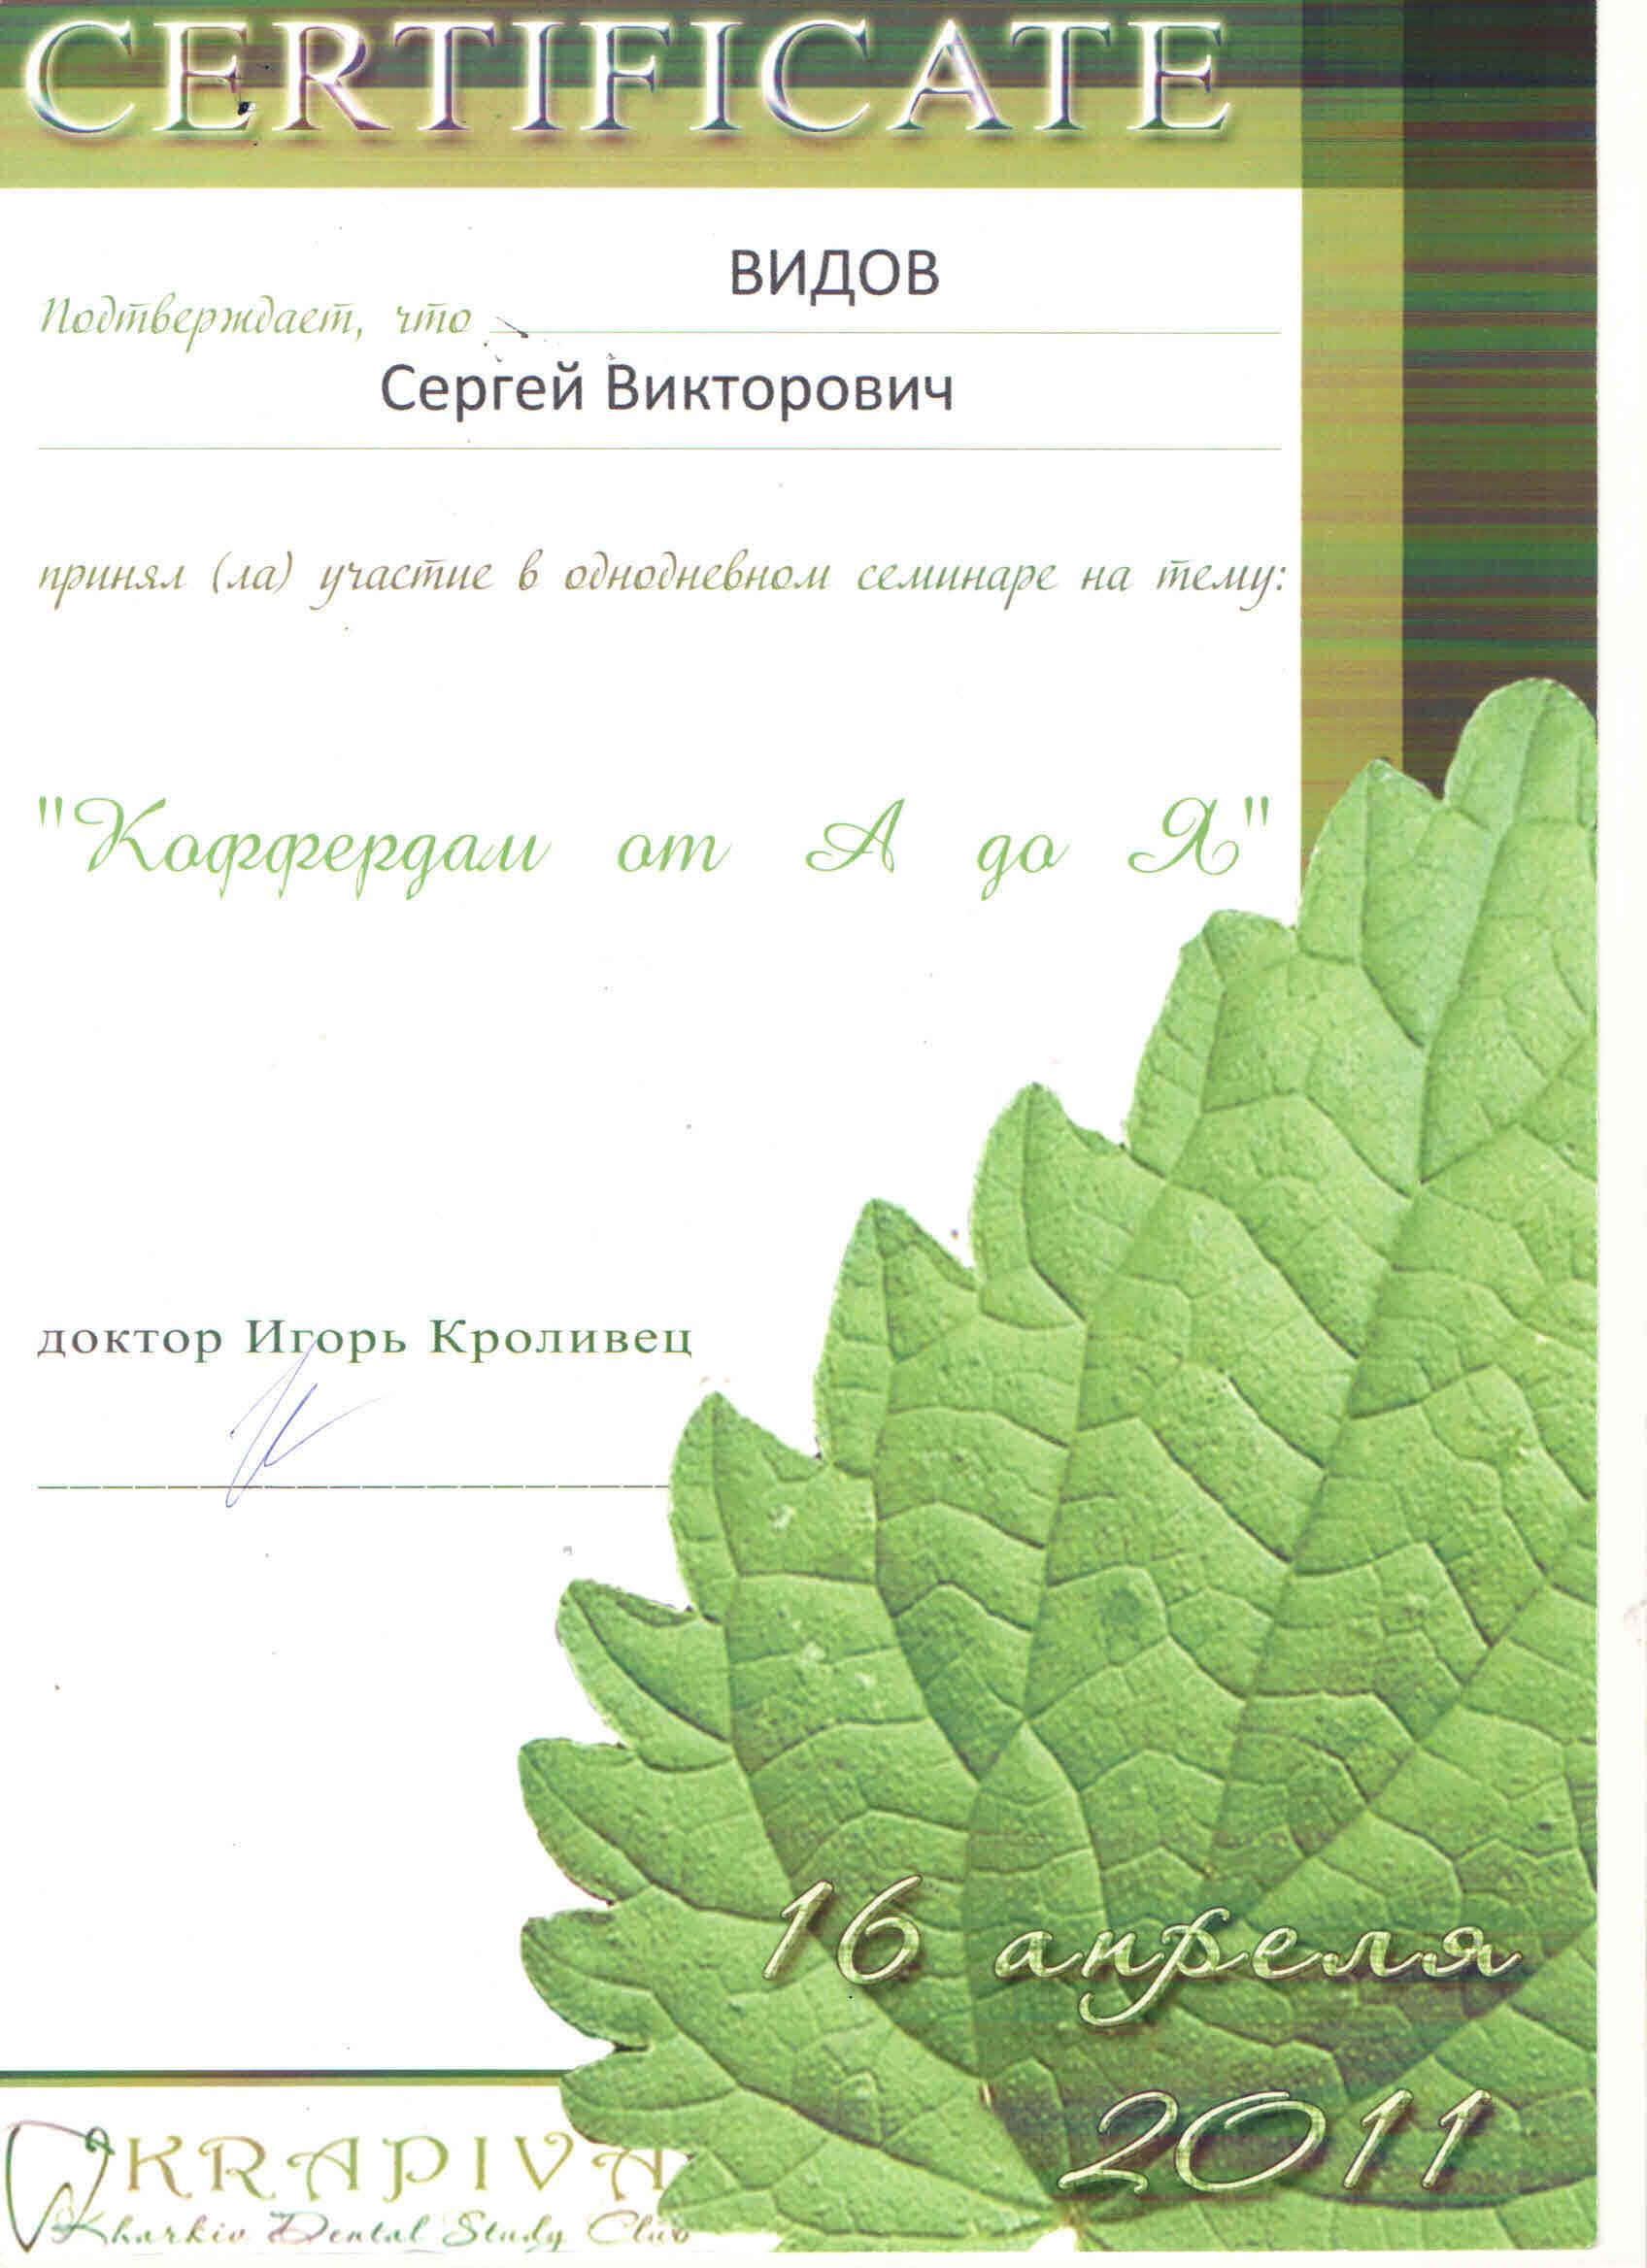 v-serghei21